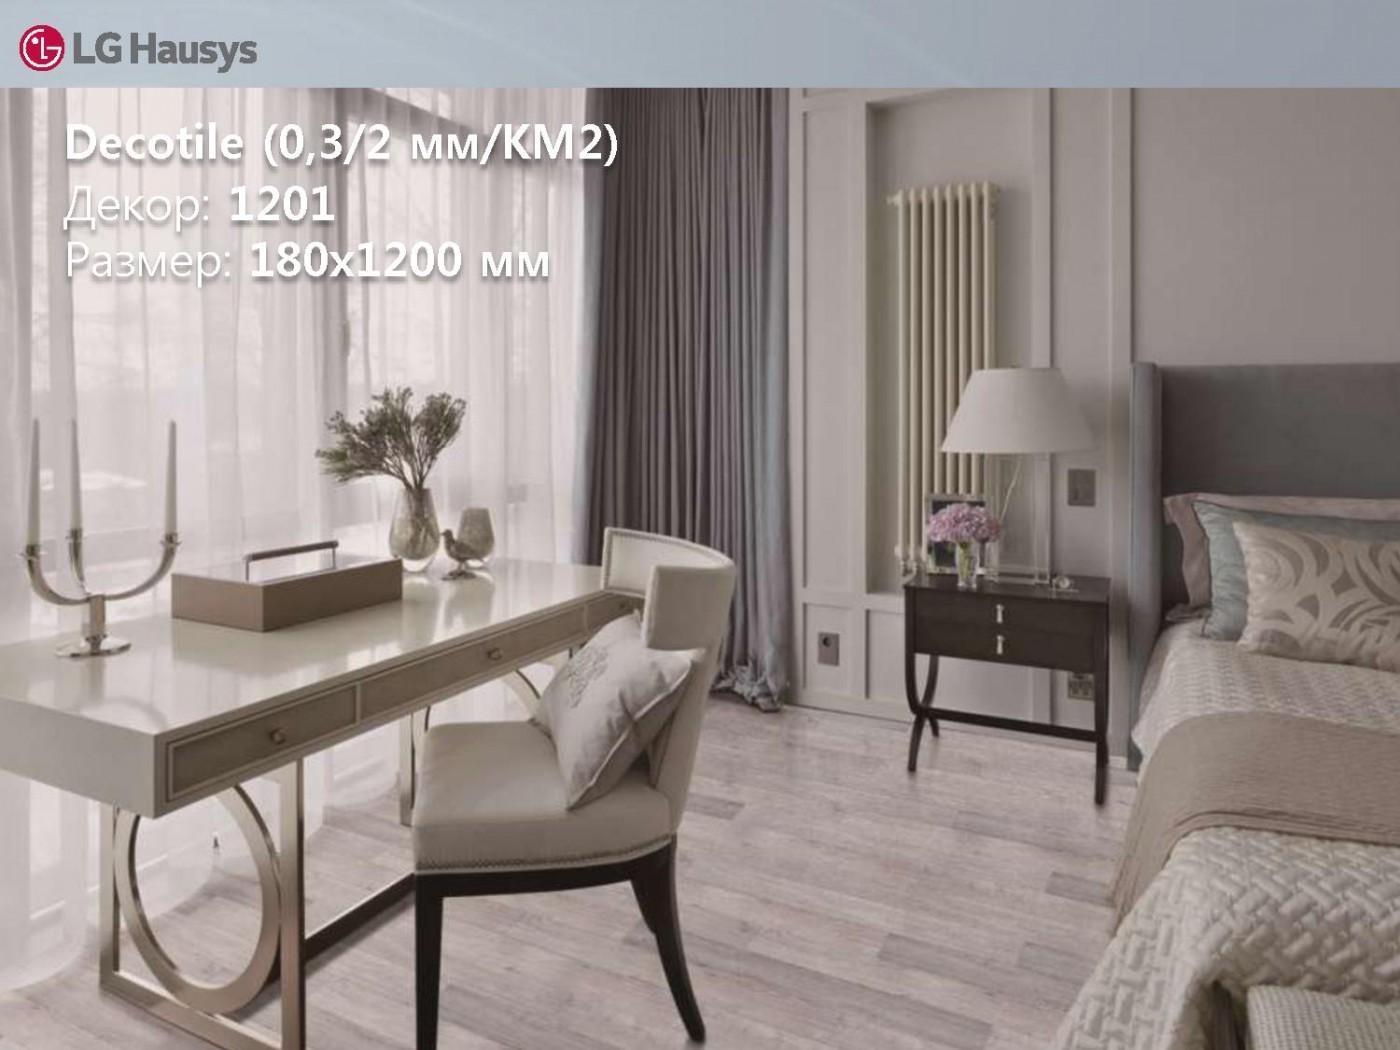 Дизайн-плитка LG - Decotile 2/0.3 (1201)